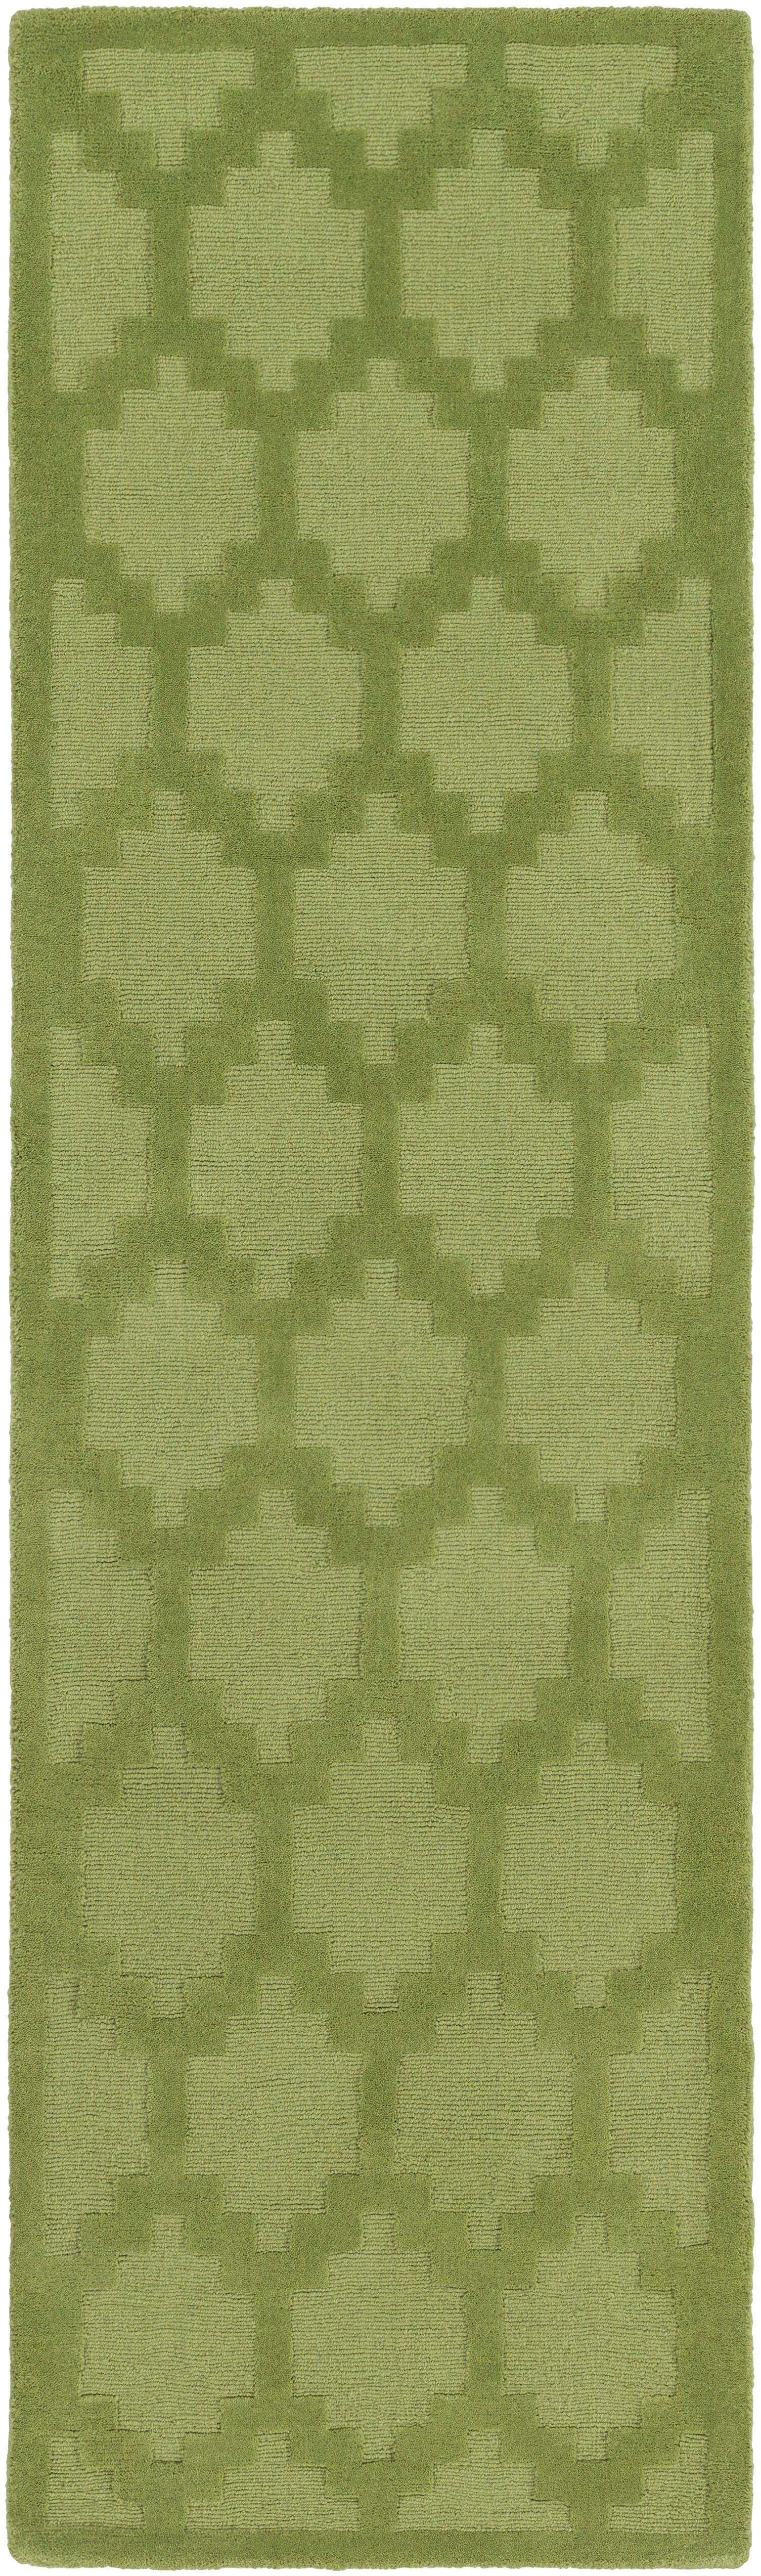 Bracey Hand-Loomed Green Area Rug Rug Size: Runner 2'3